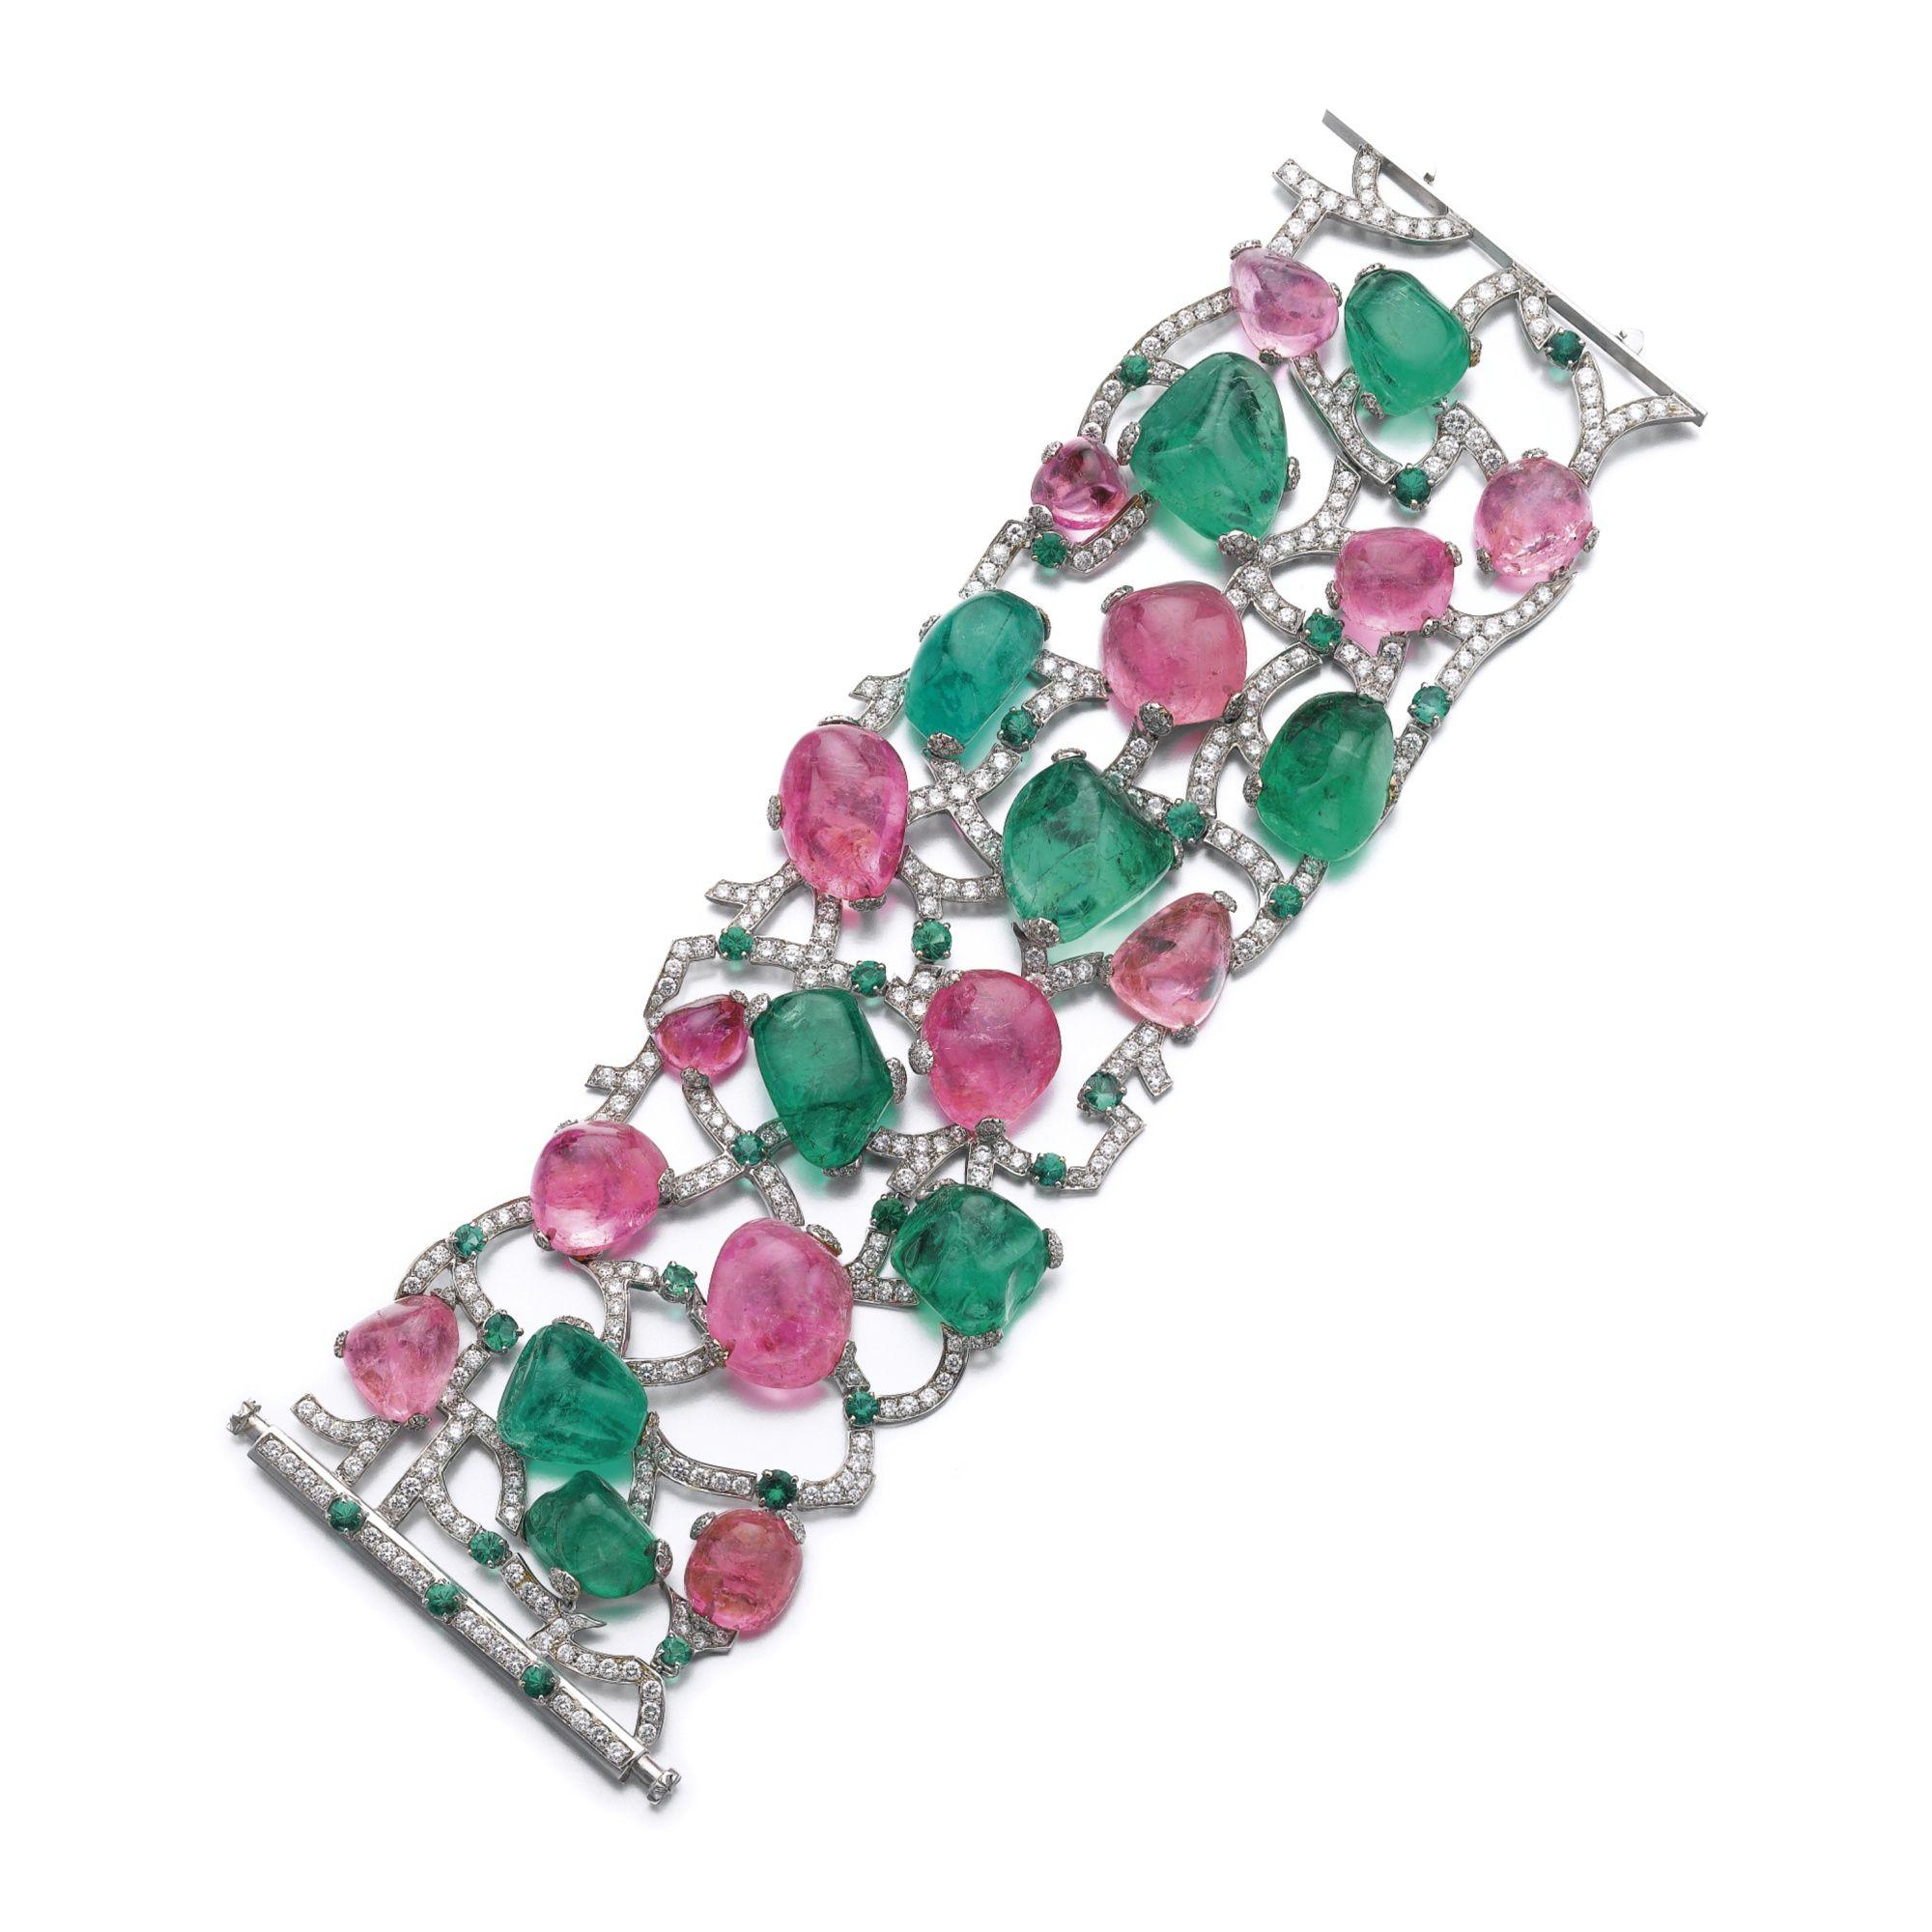 Emerald pink sapphire and diamond bracelet usassiu michele della